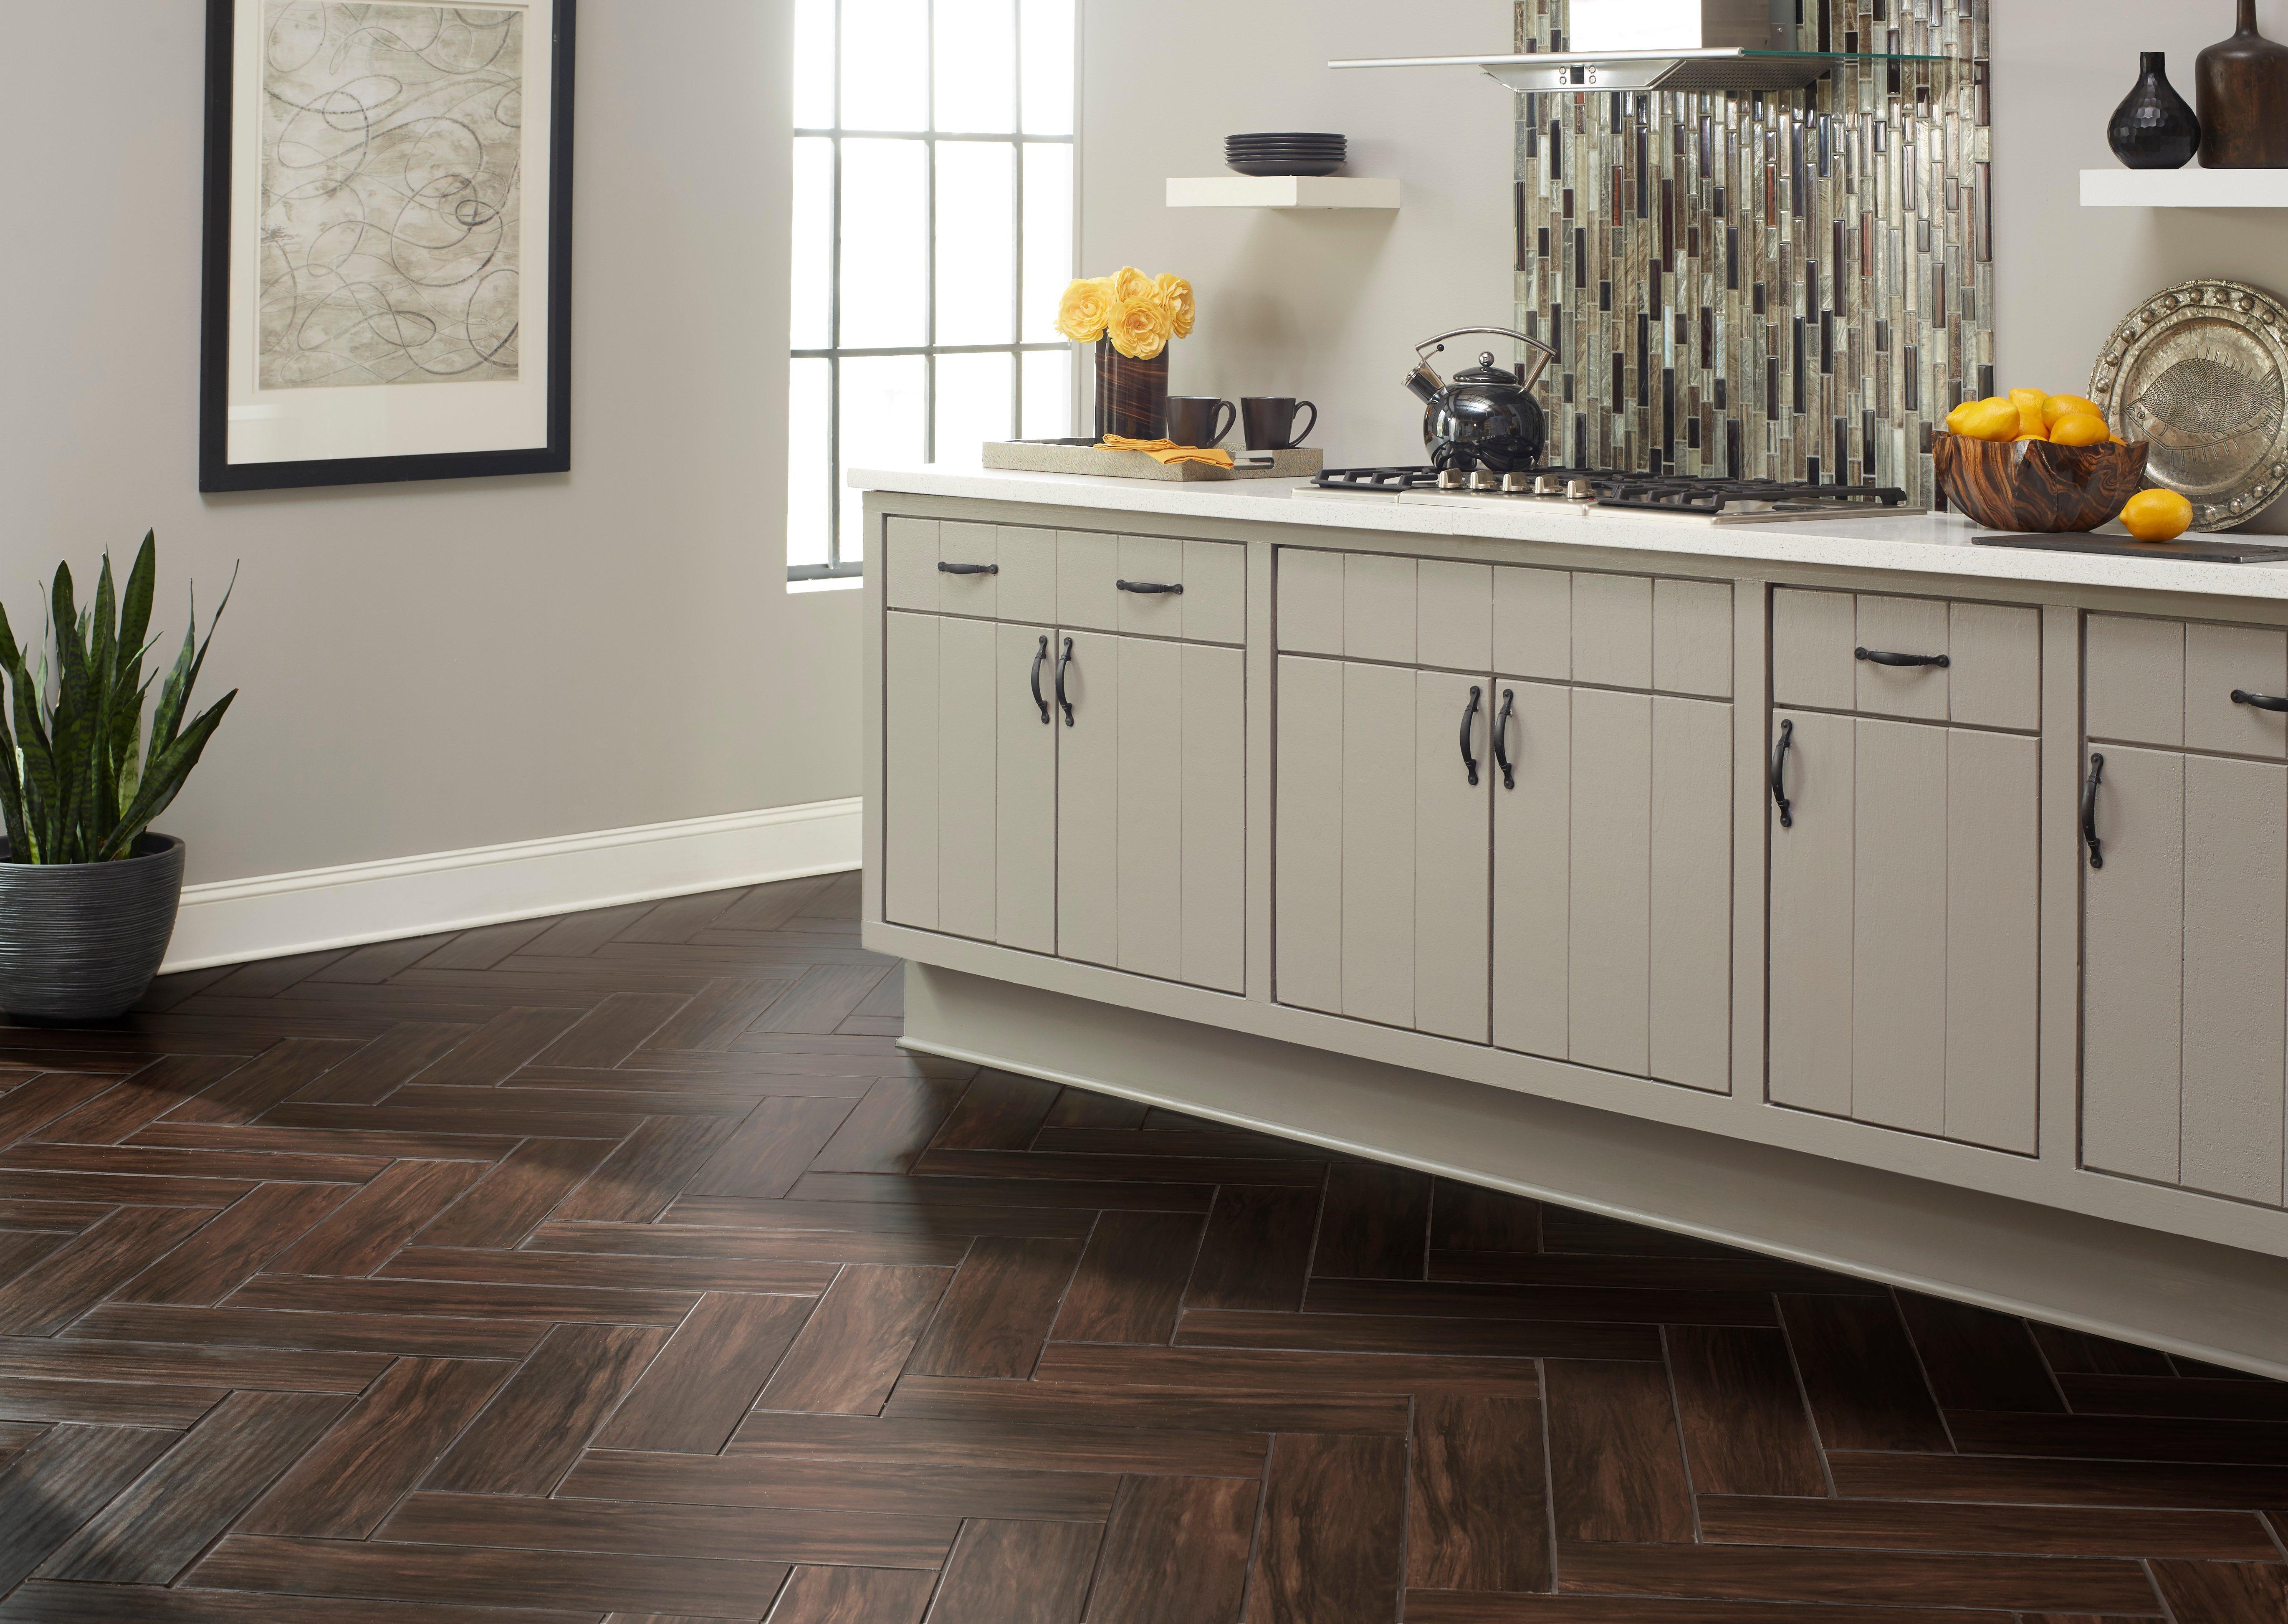 Porcelain tiles for kitchens Wood Look Kitchen 19 Stockbridge Espresso Wood Plank Porcelain Tile Kitchen Floor Room Floor Decor Kitchen Gallery Floor Decor